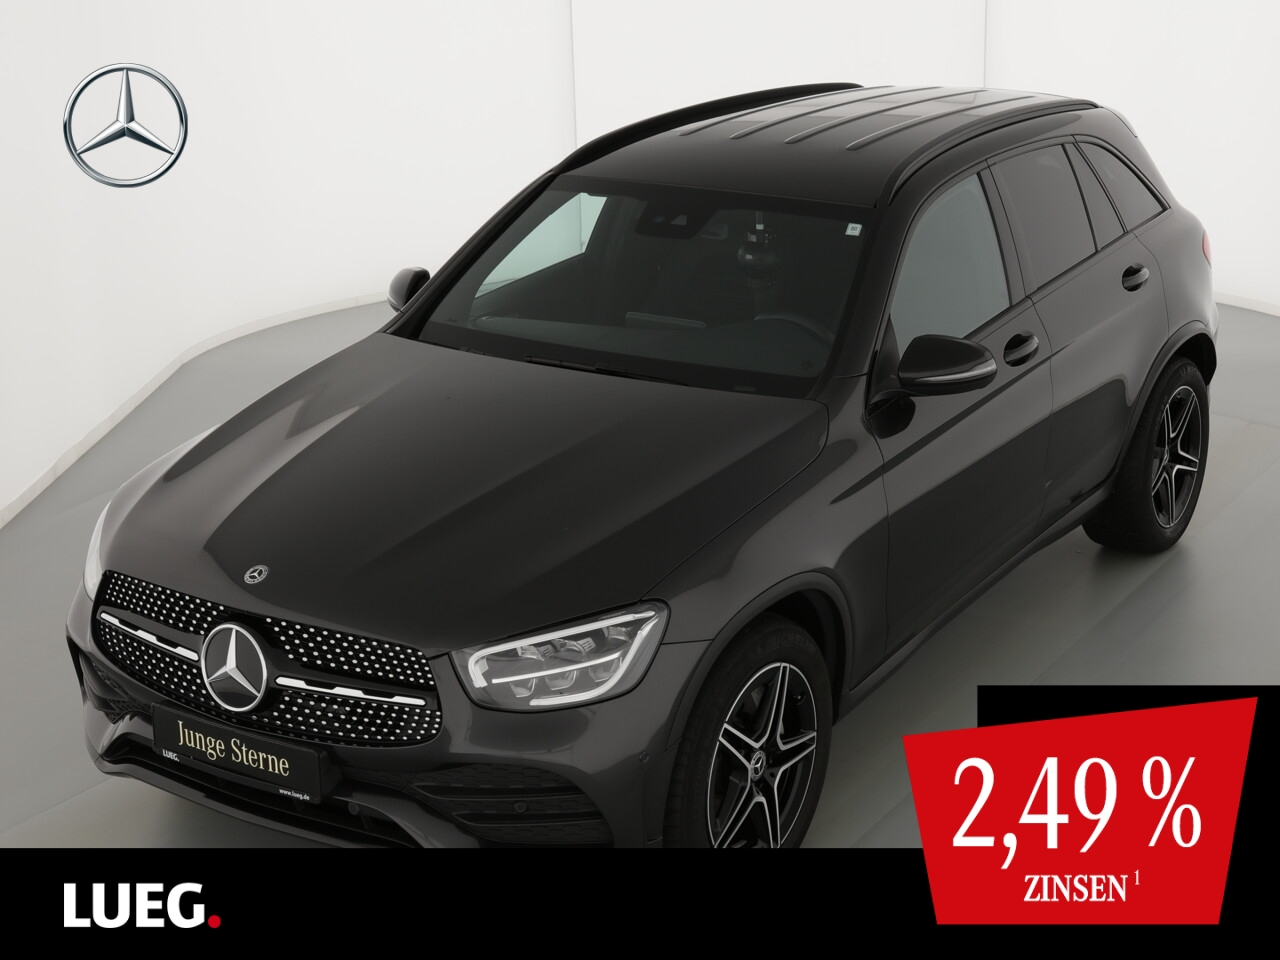 Mercedes-Benz GLC 200 4M AMG+MBUX+Navi+LED-HP+SpurP+NightP+RFK, Jahr 2019, Benzin